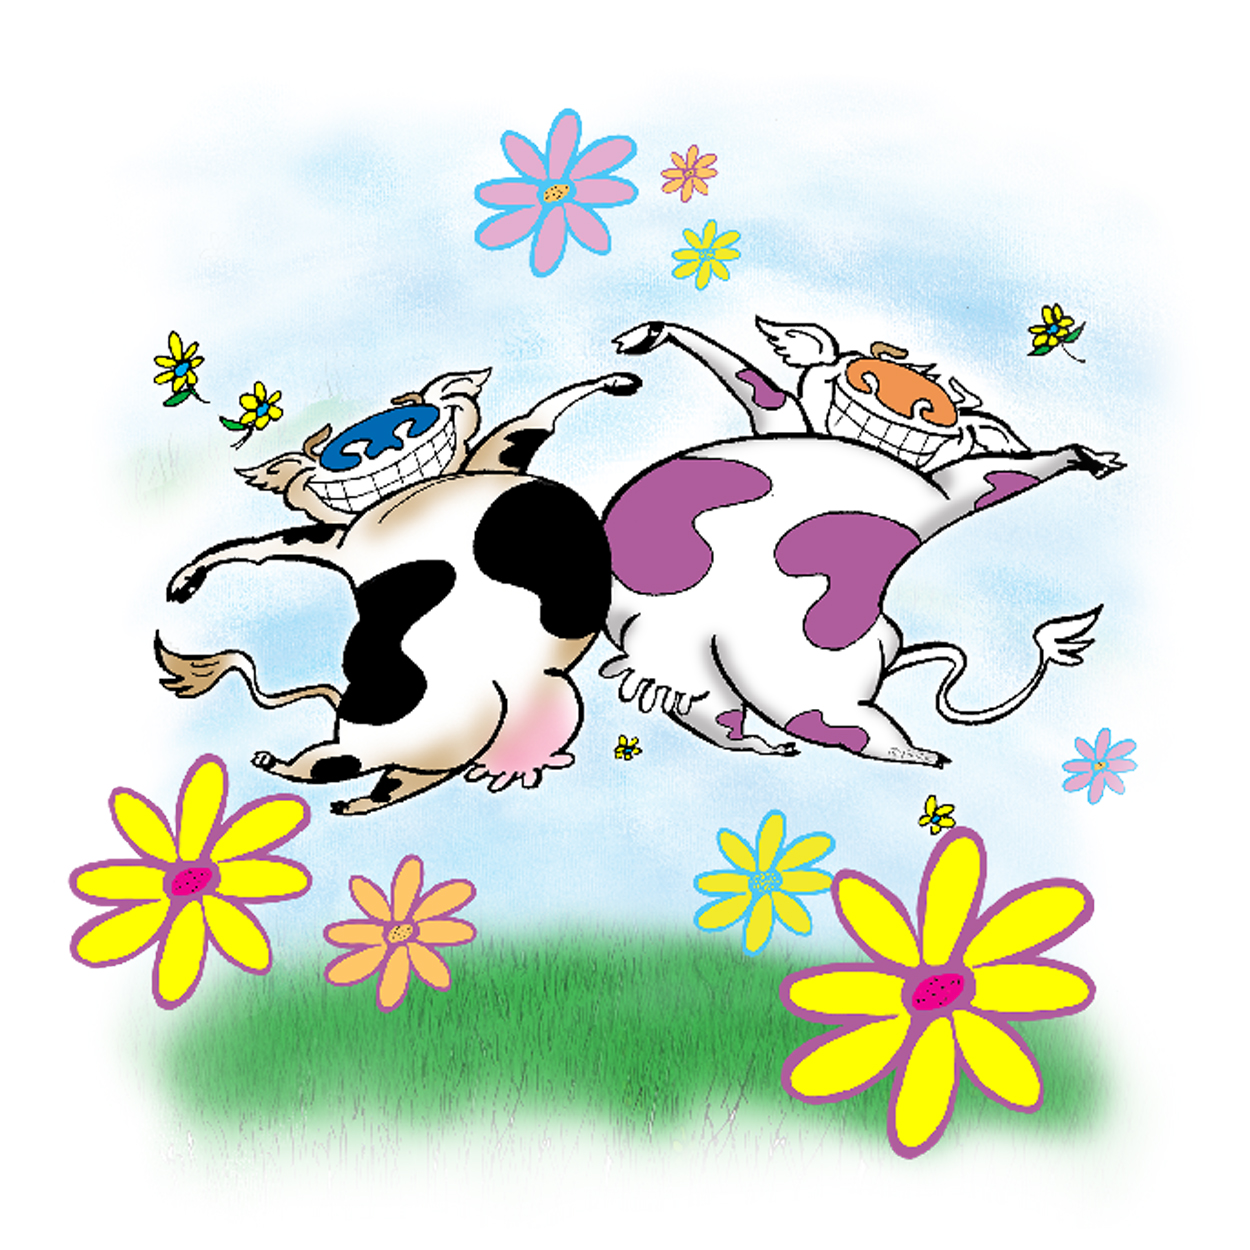 COW JUMP JOY.jpg